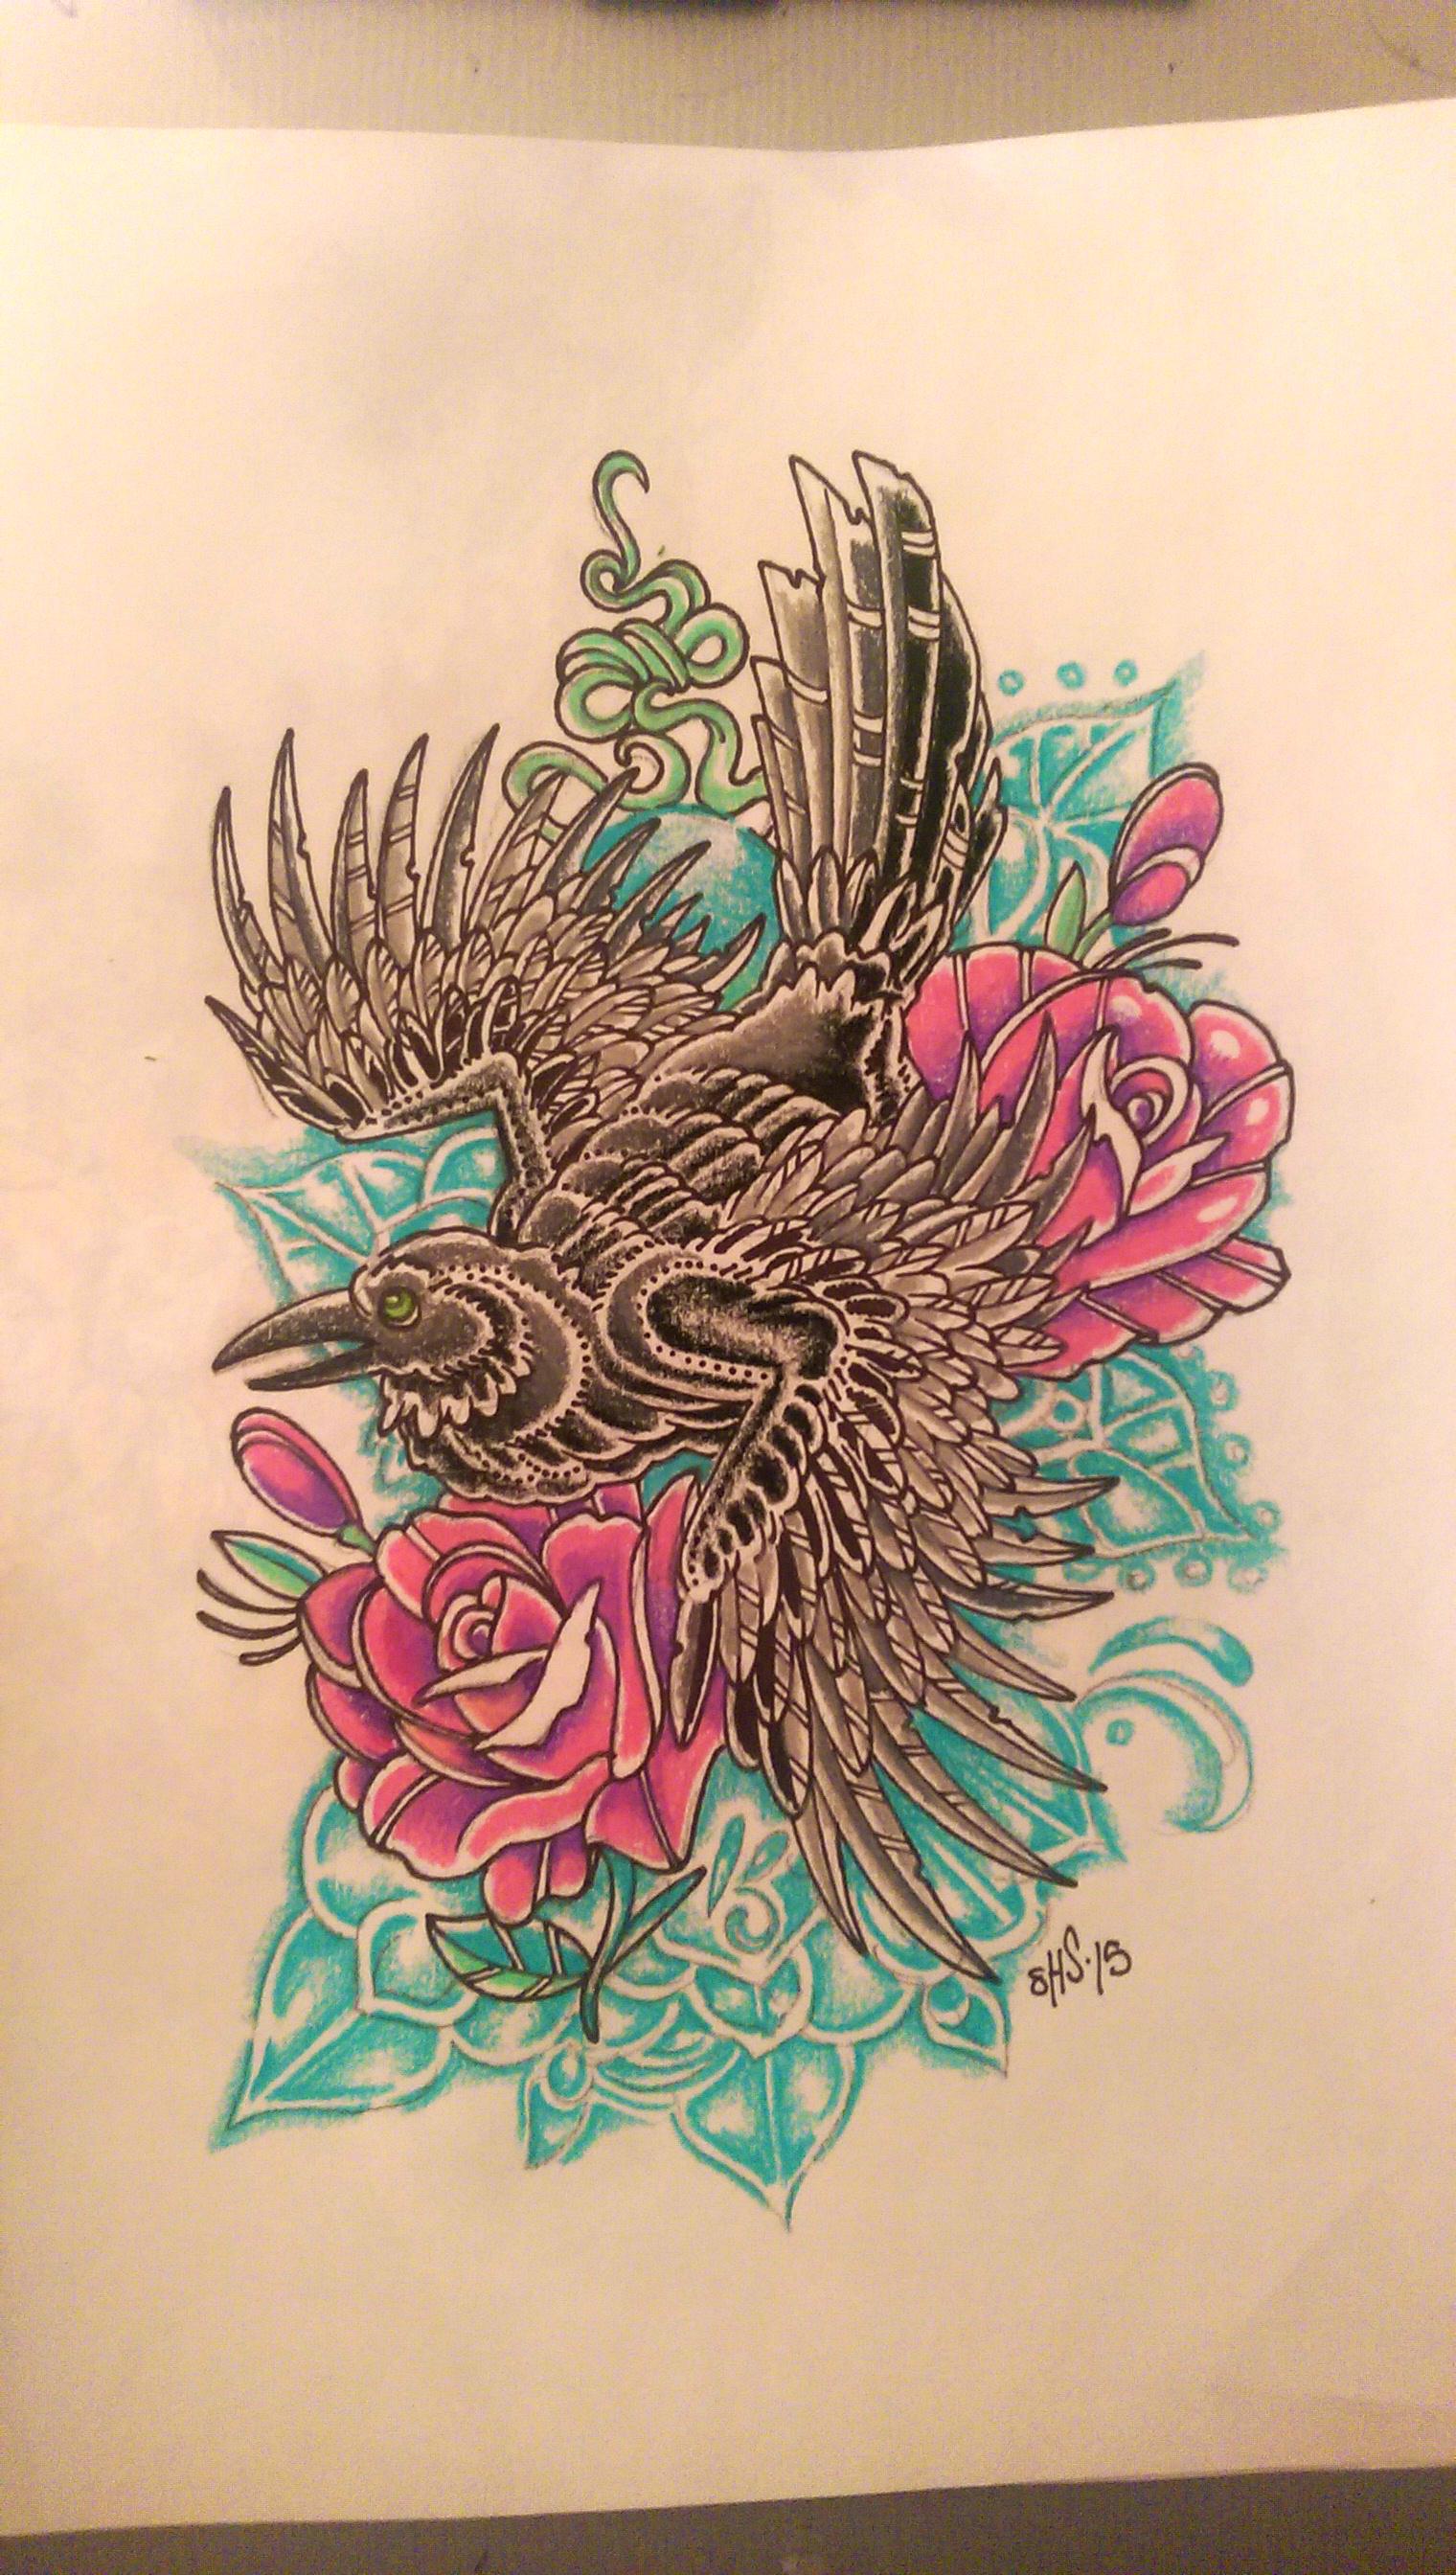 Longmont Tattoo Shop Artist Raul Regalado Skinhouse Studio